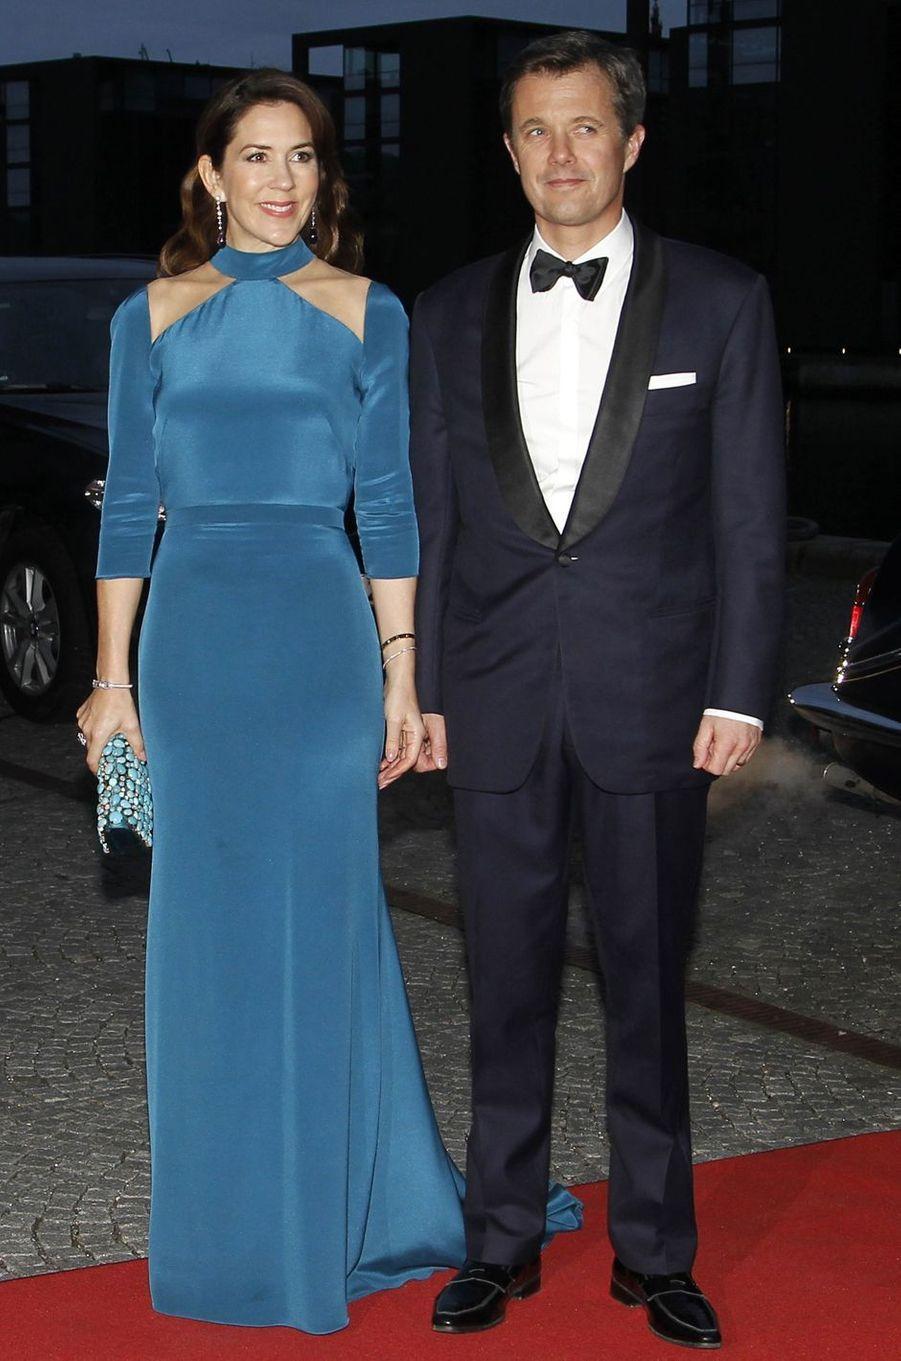 La princesse Mary de Danemark en Jesper Hovring, le 29 mars 2017